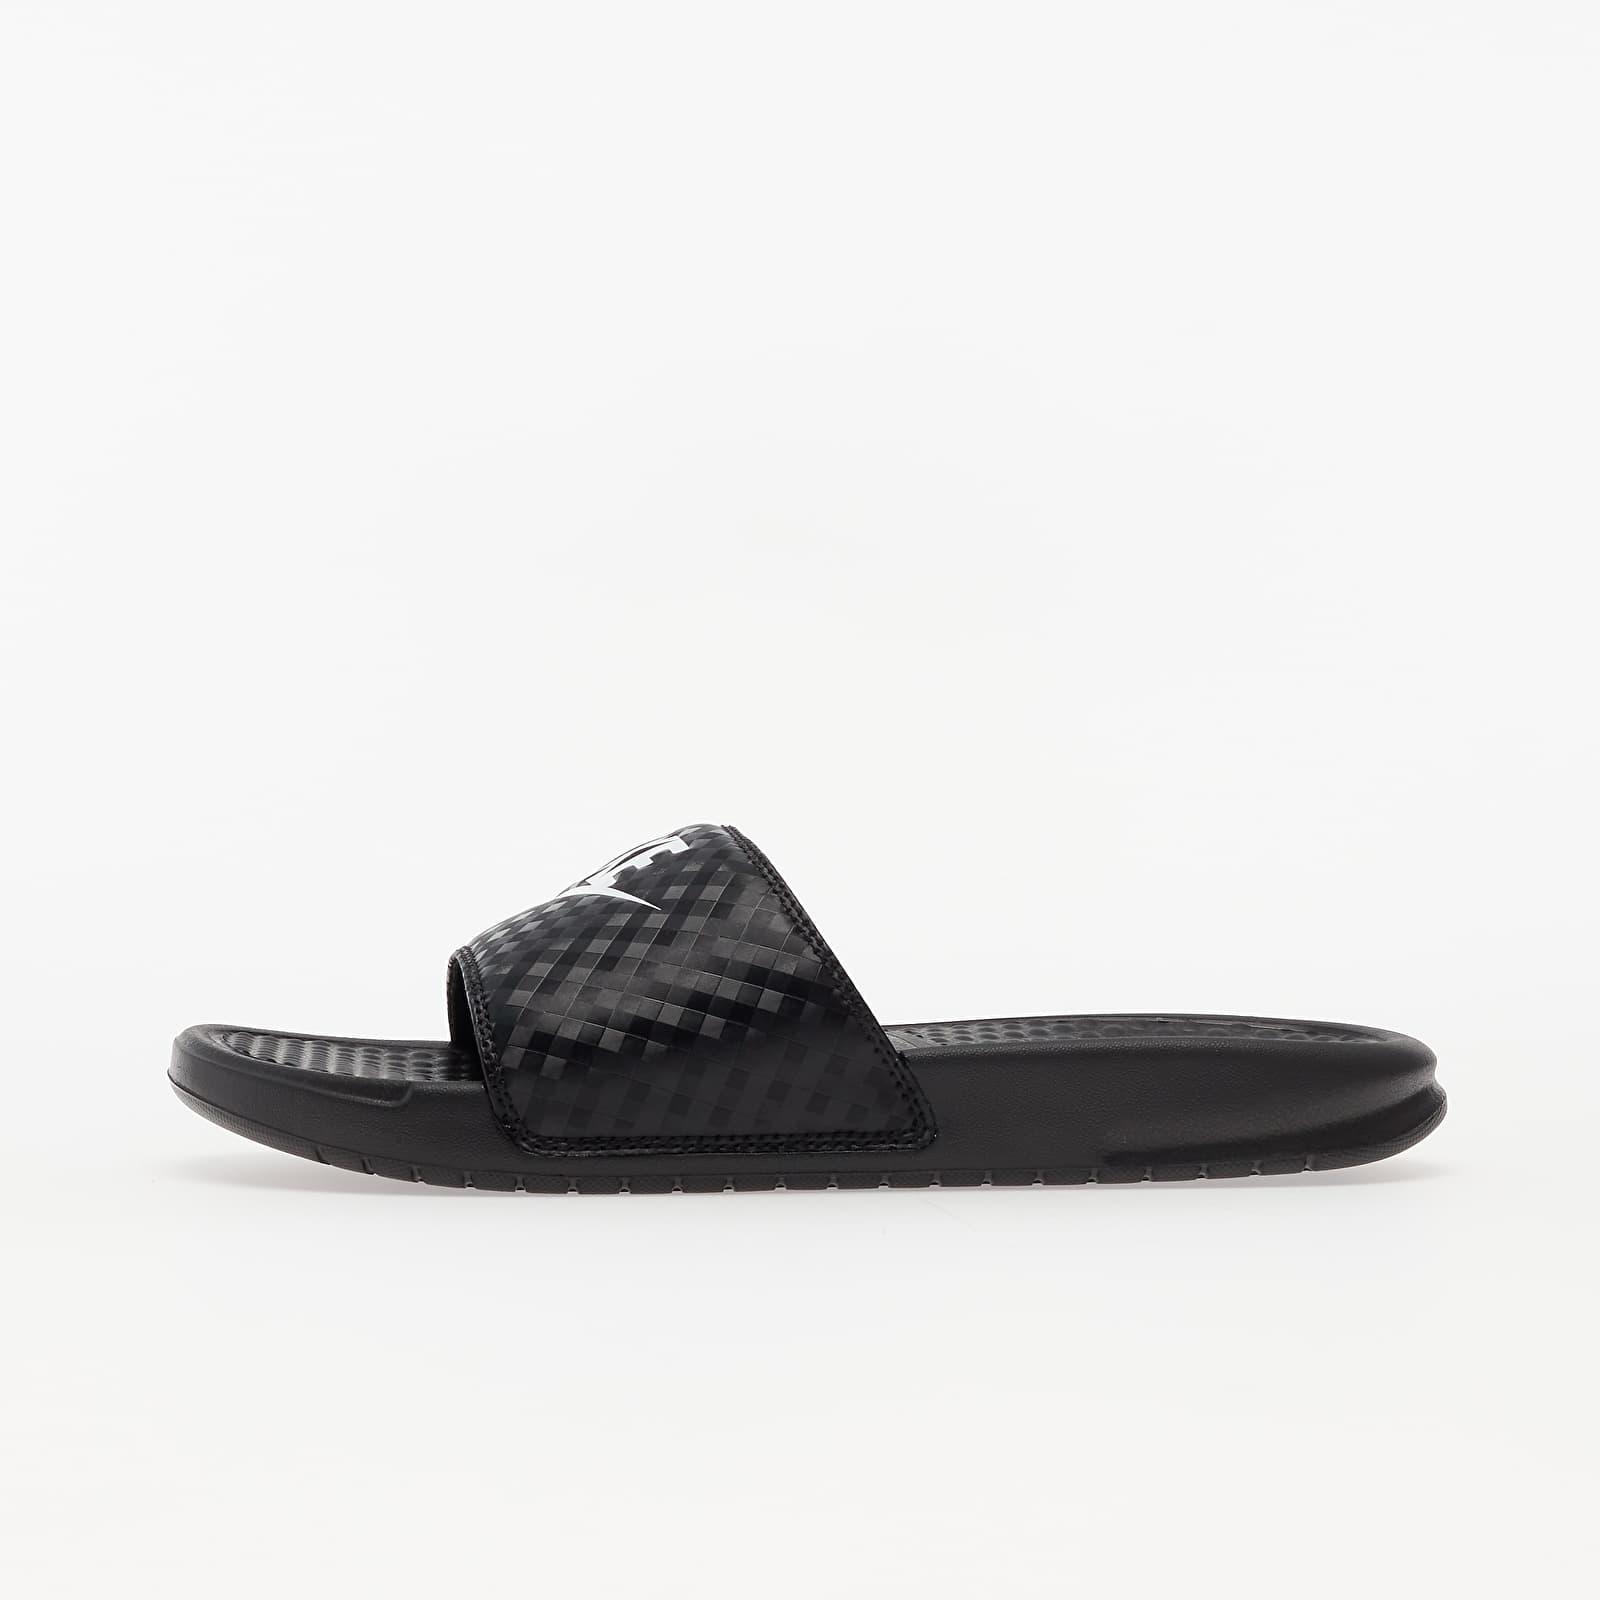 Zapatillas mujer Nike Wmns Benassi Jdi Black/ White